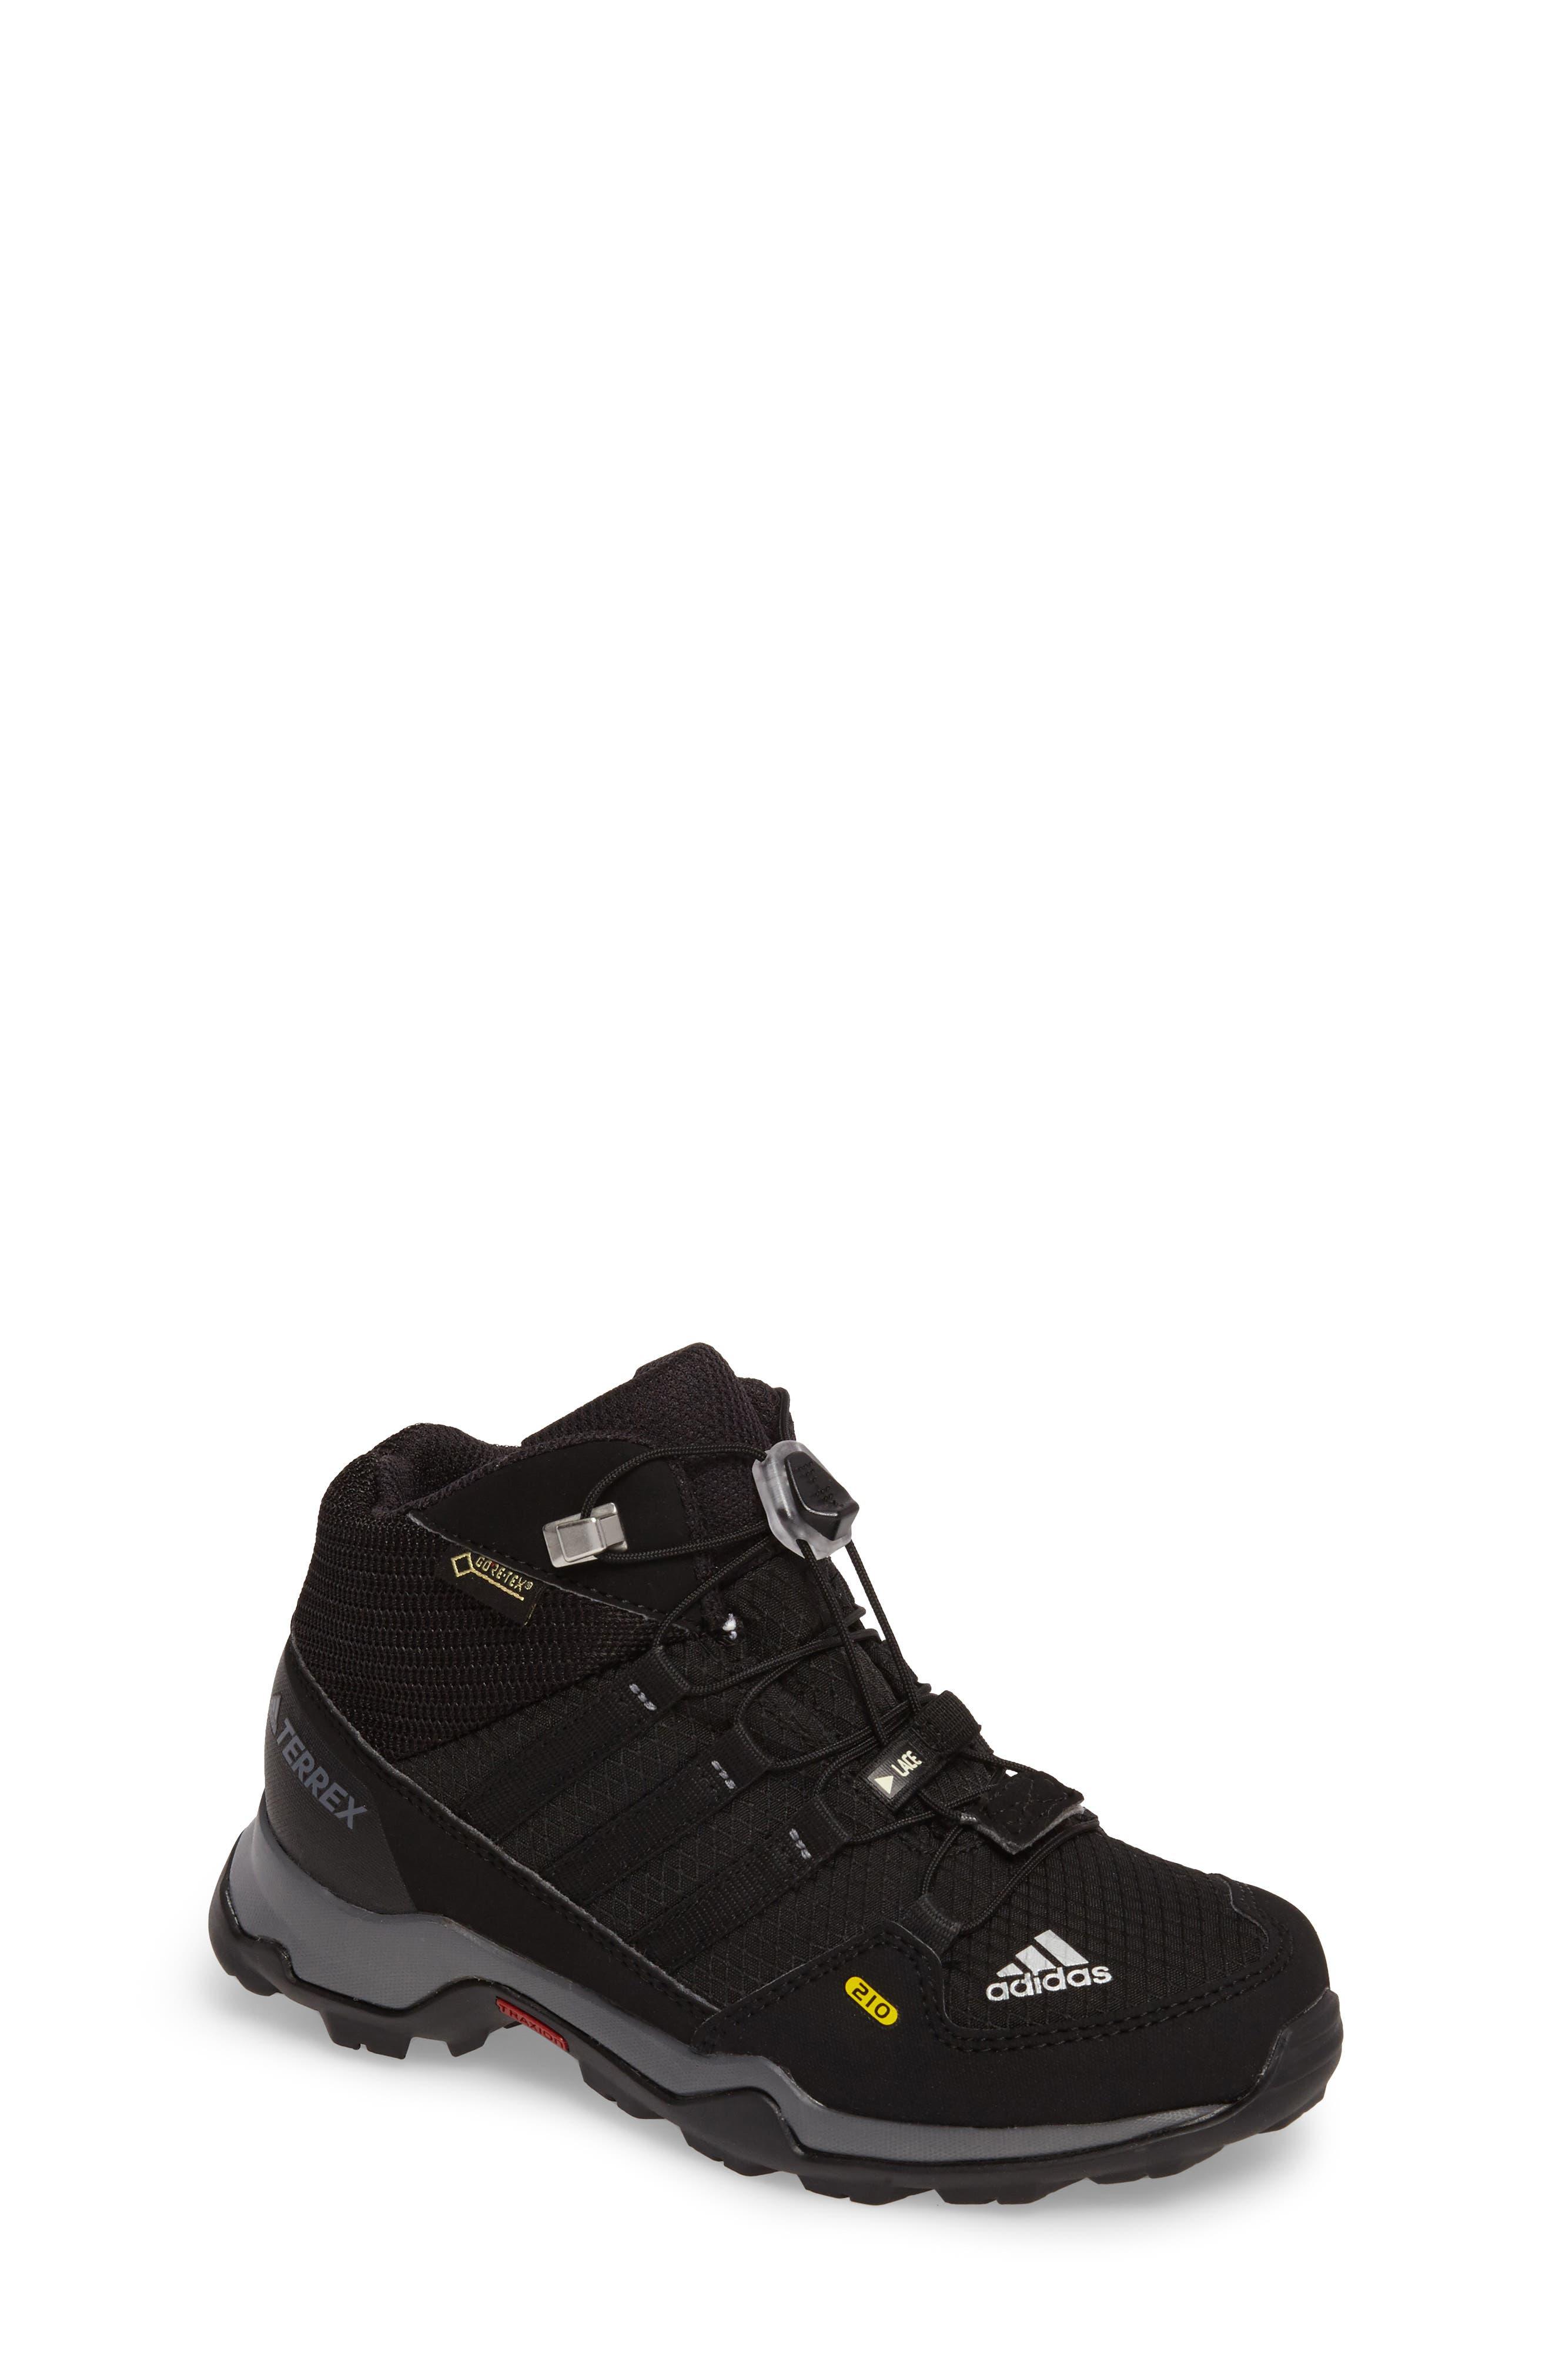 Terrex Mid Gore-Tex<sup>®</sup> Insulated Waterproof Sneaker Boot,                         Main,                         color, 001